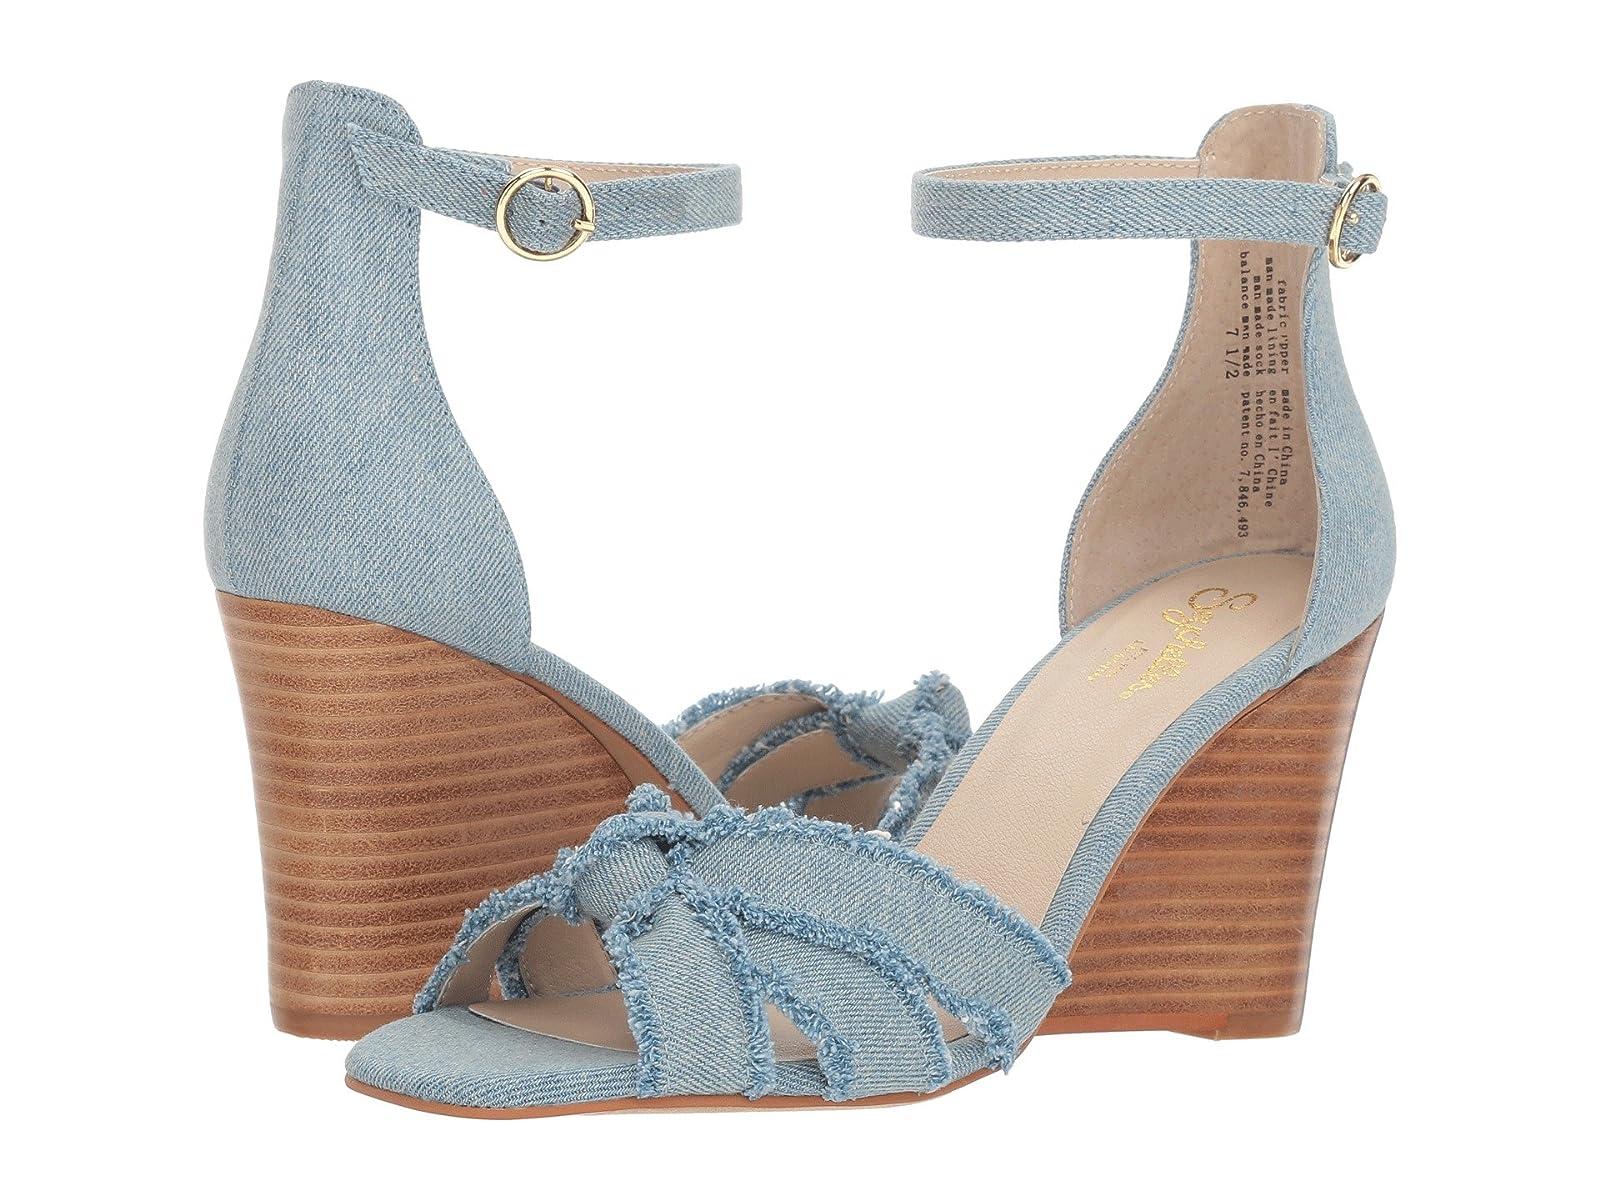 Seychelles SunraysAtmospheric grades have affordable shoes